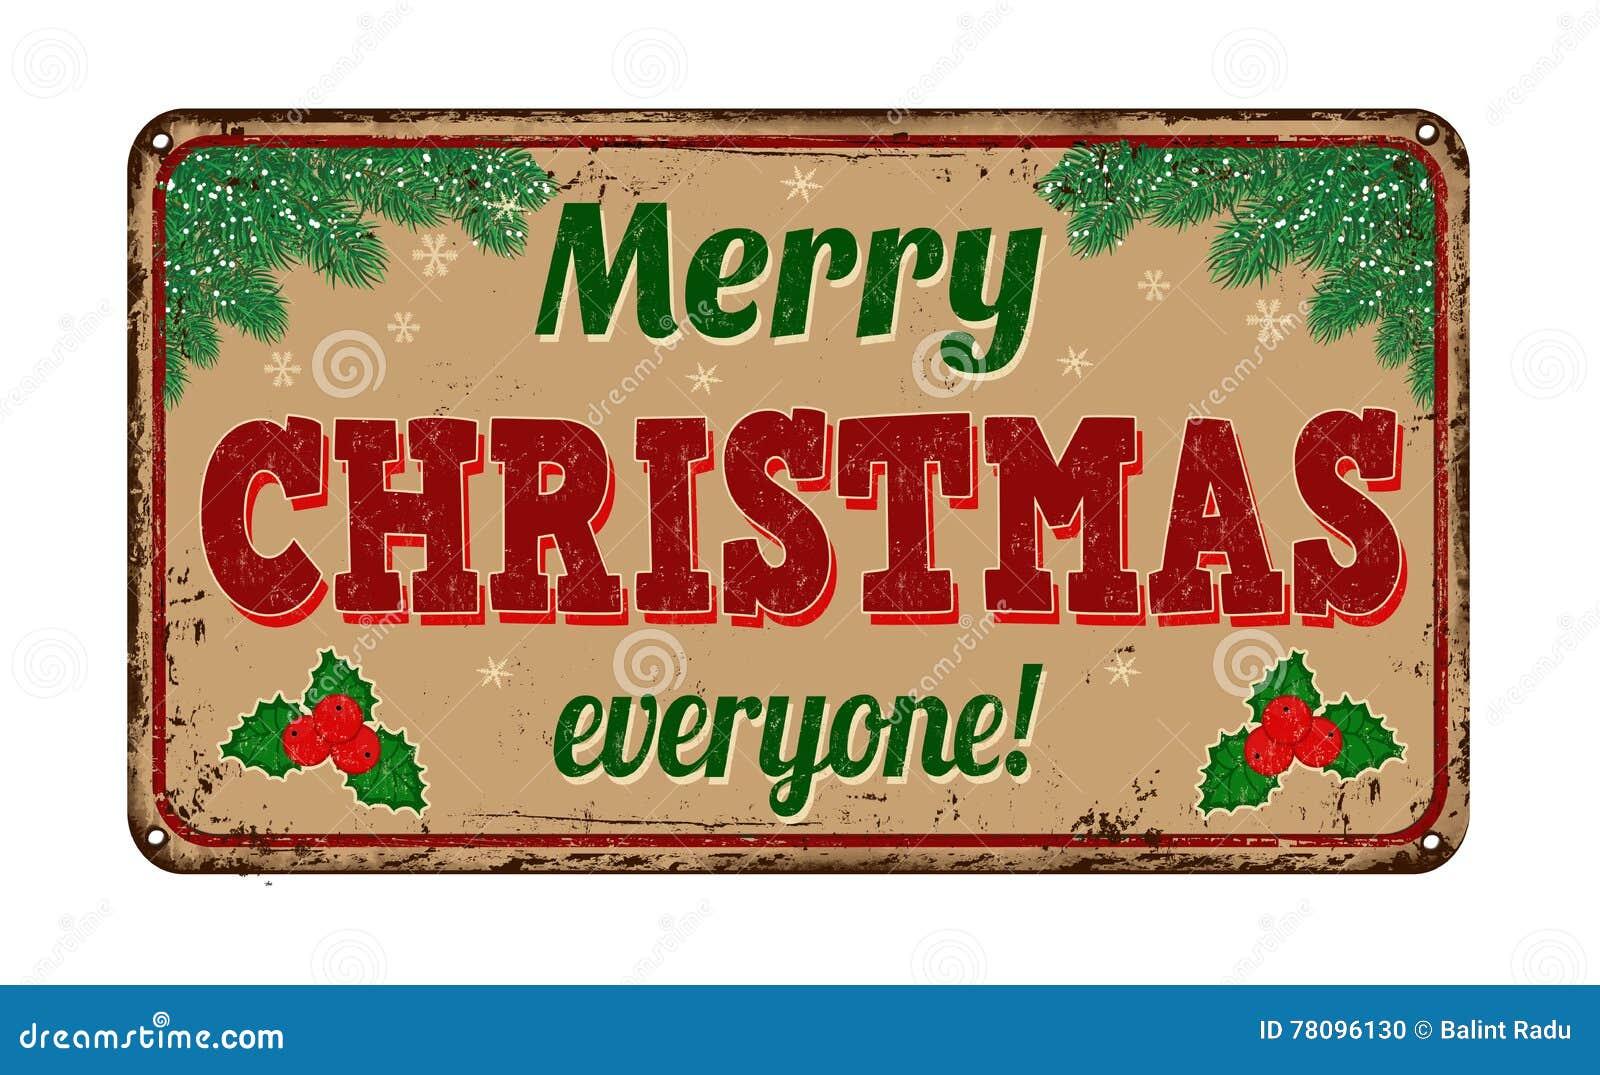 Merry Christmas Everyone, Vintage Metal Sign Stock Vector ...